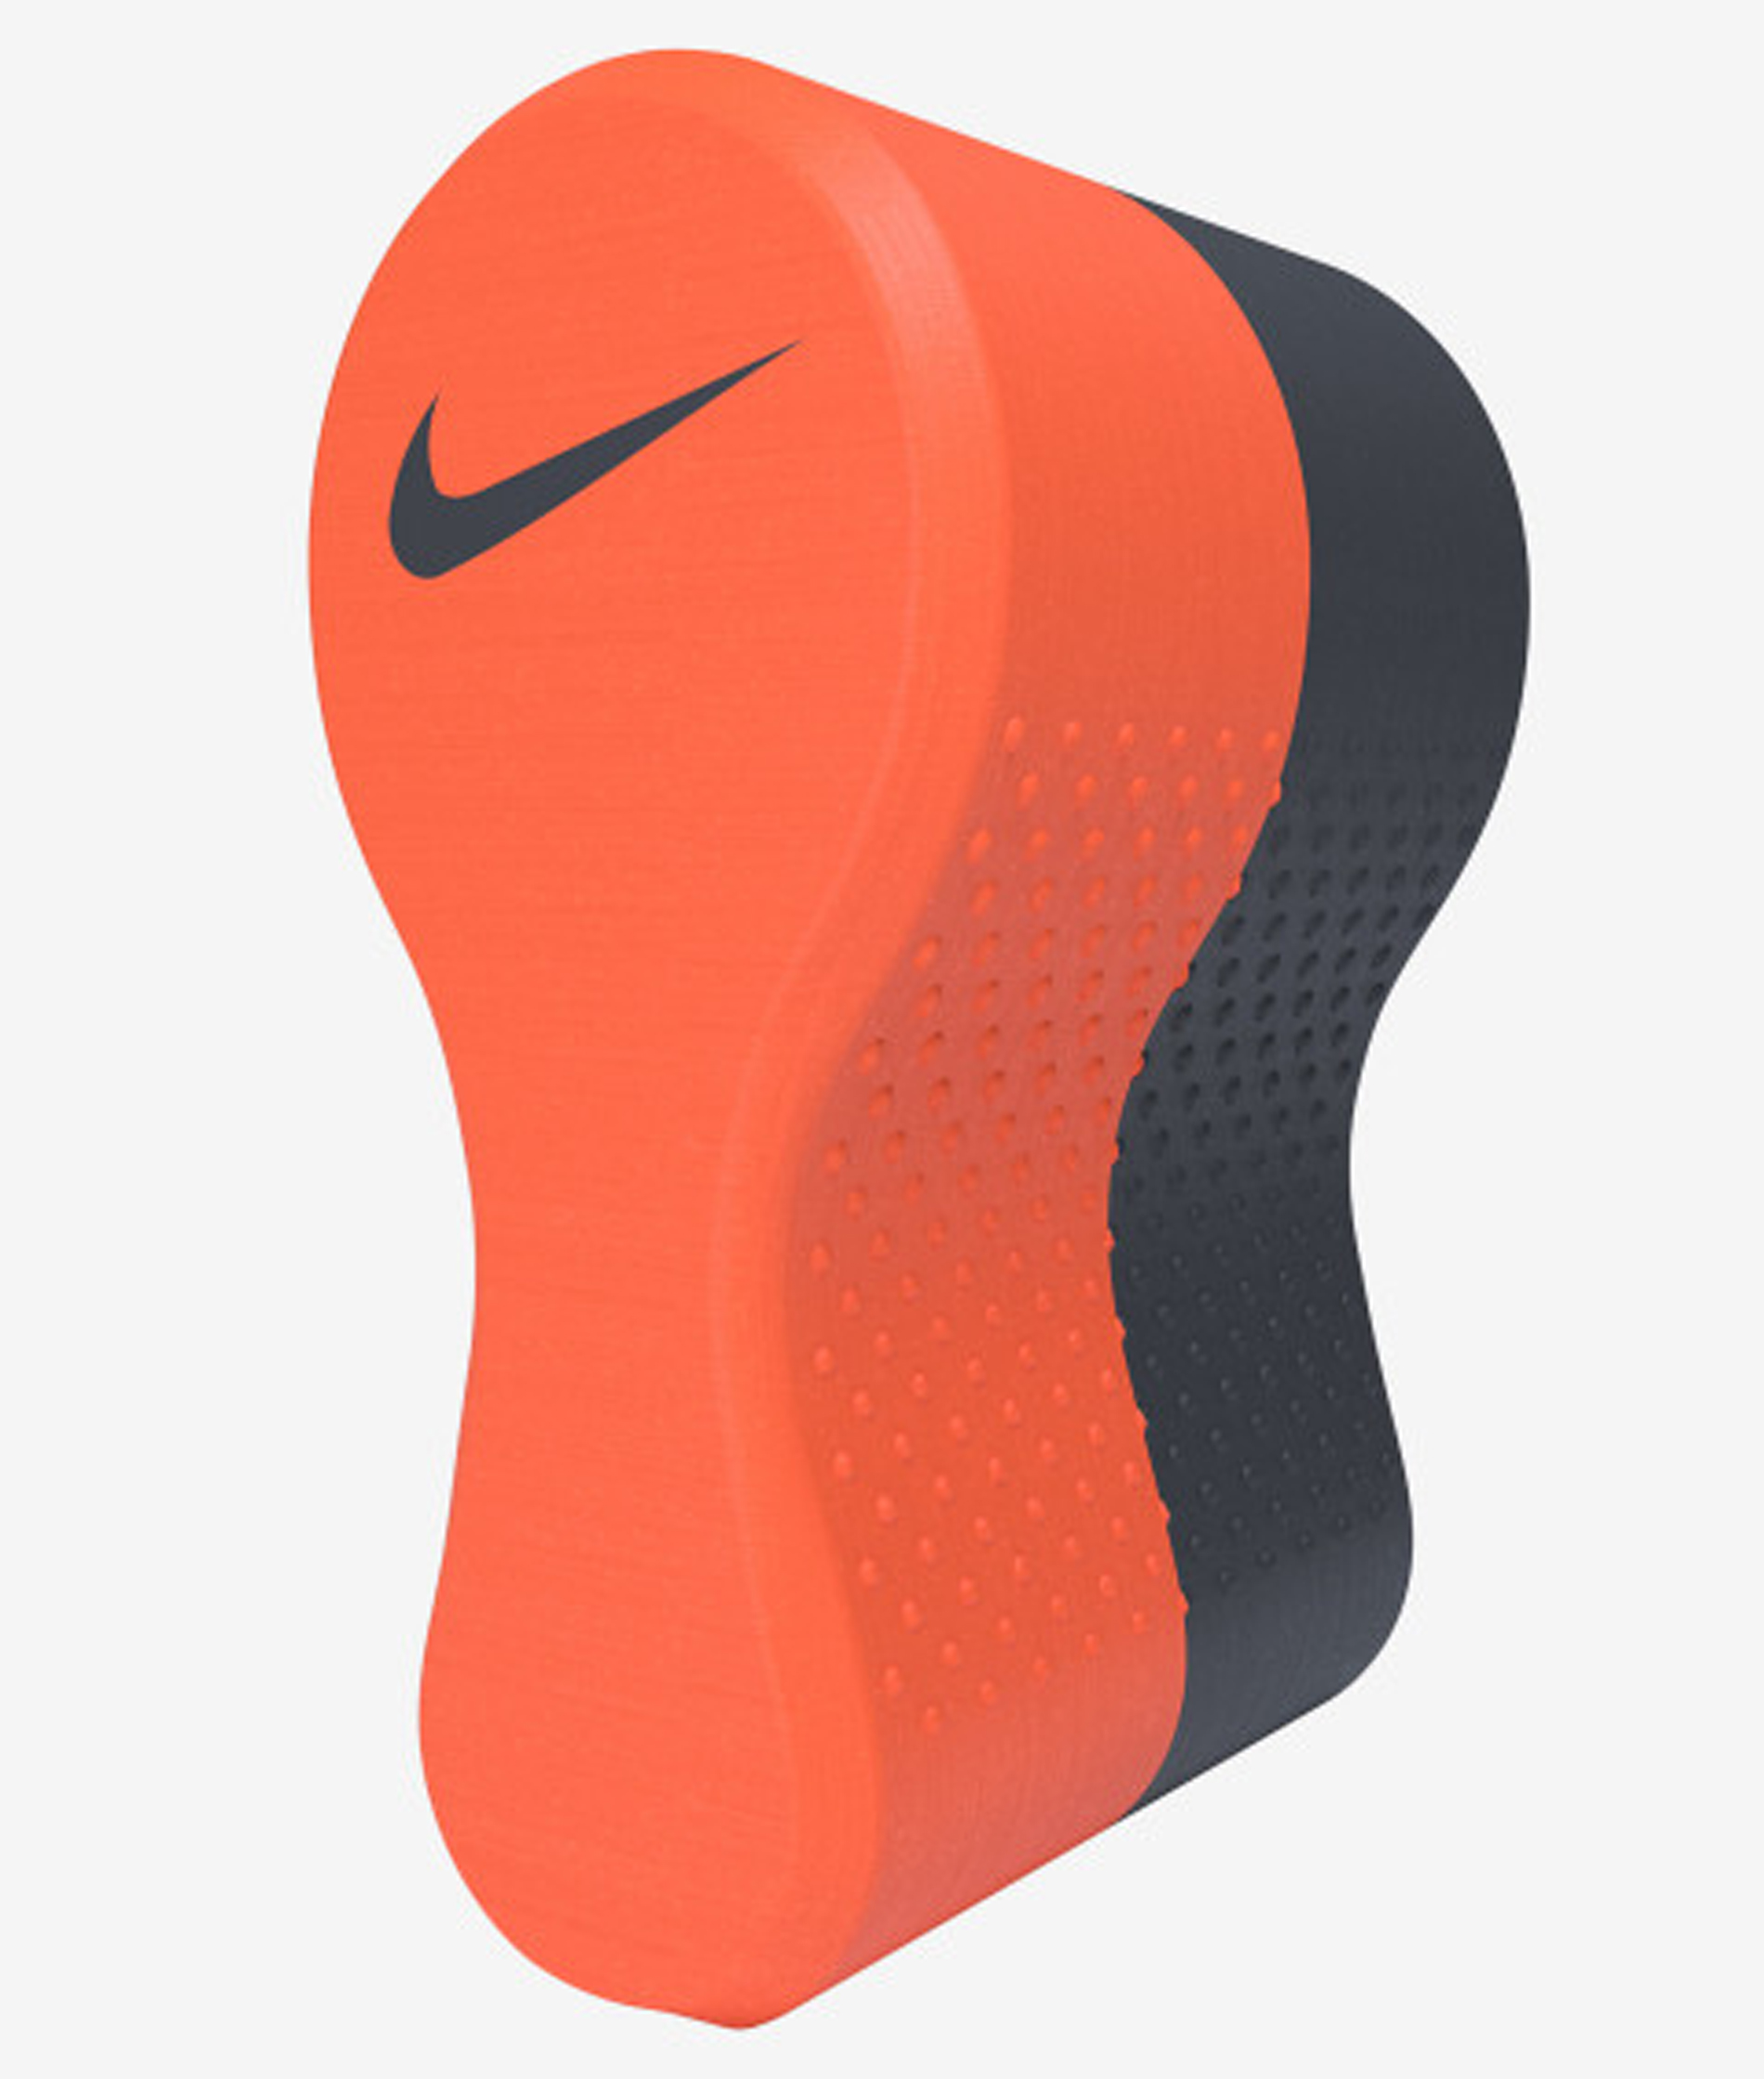 Nike Swim Pull Buoy